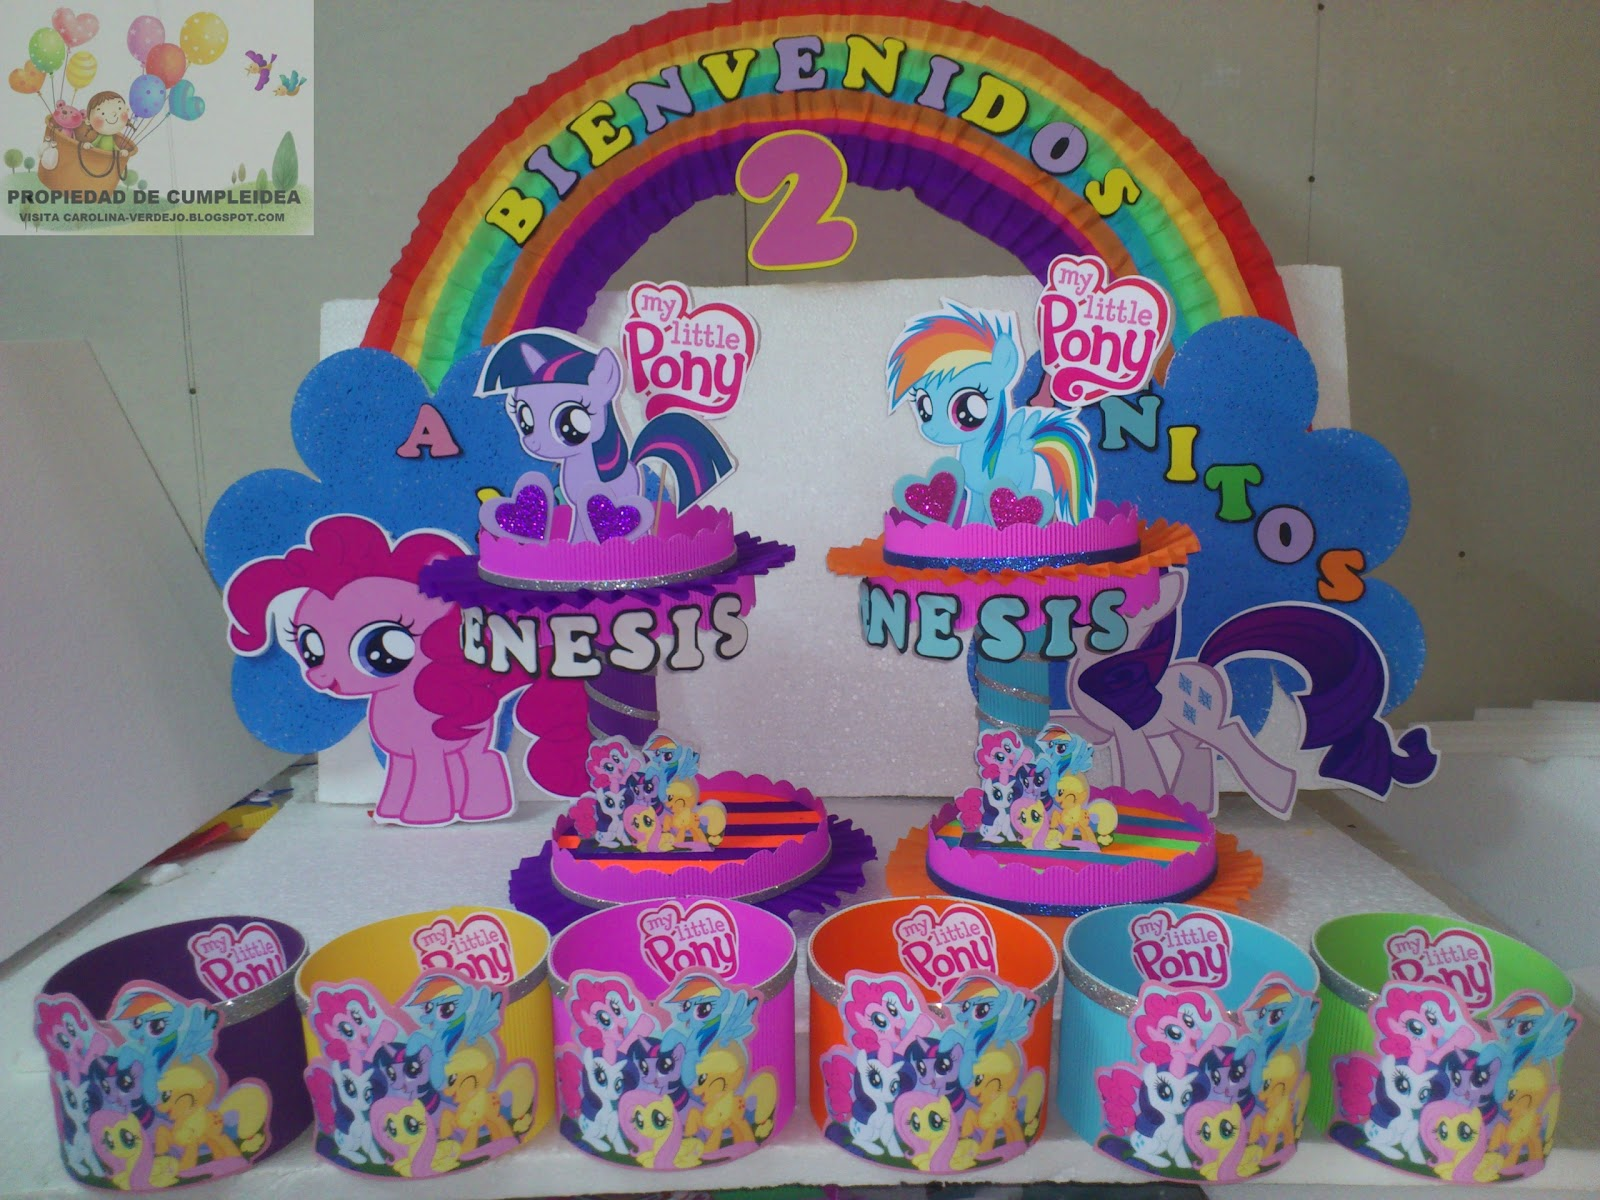 http://3.bp.blogspot.com/-uKYtkGHW3k4/UGfCqvrz-SI/AAAAAAAAB2U/9-ZhJX1ohho/s1600/pack+litte+pony.jpg